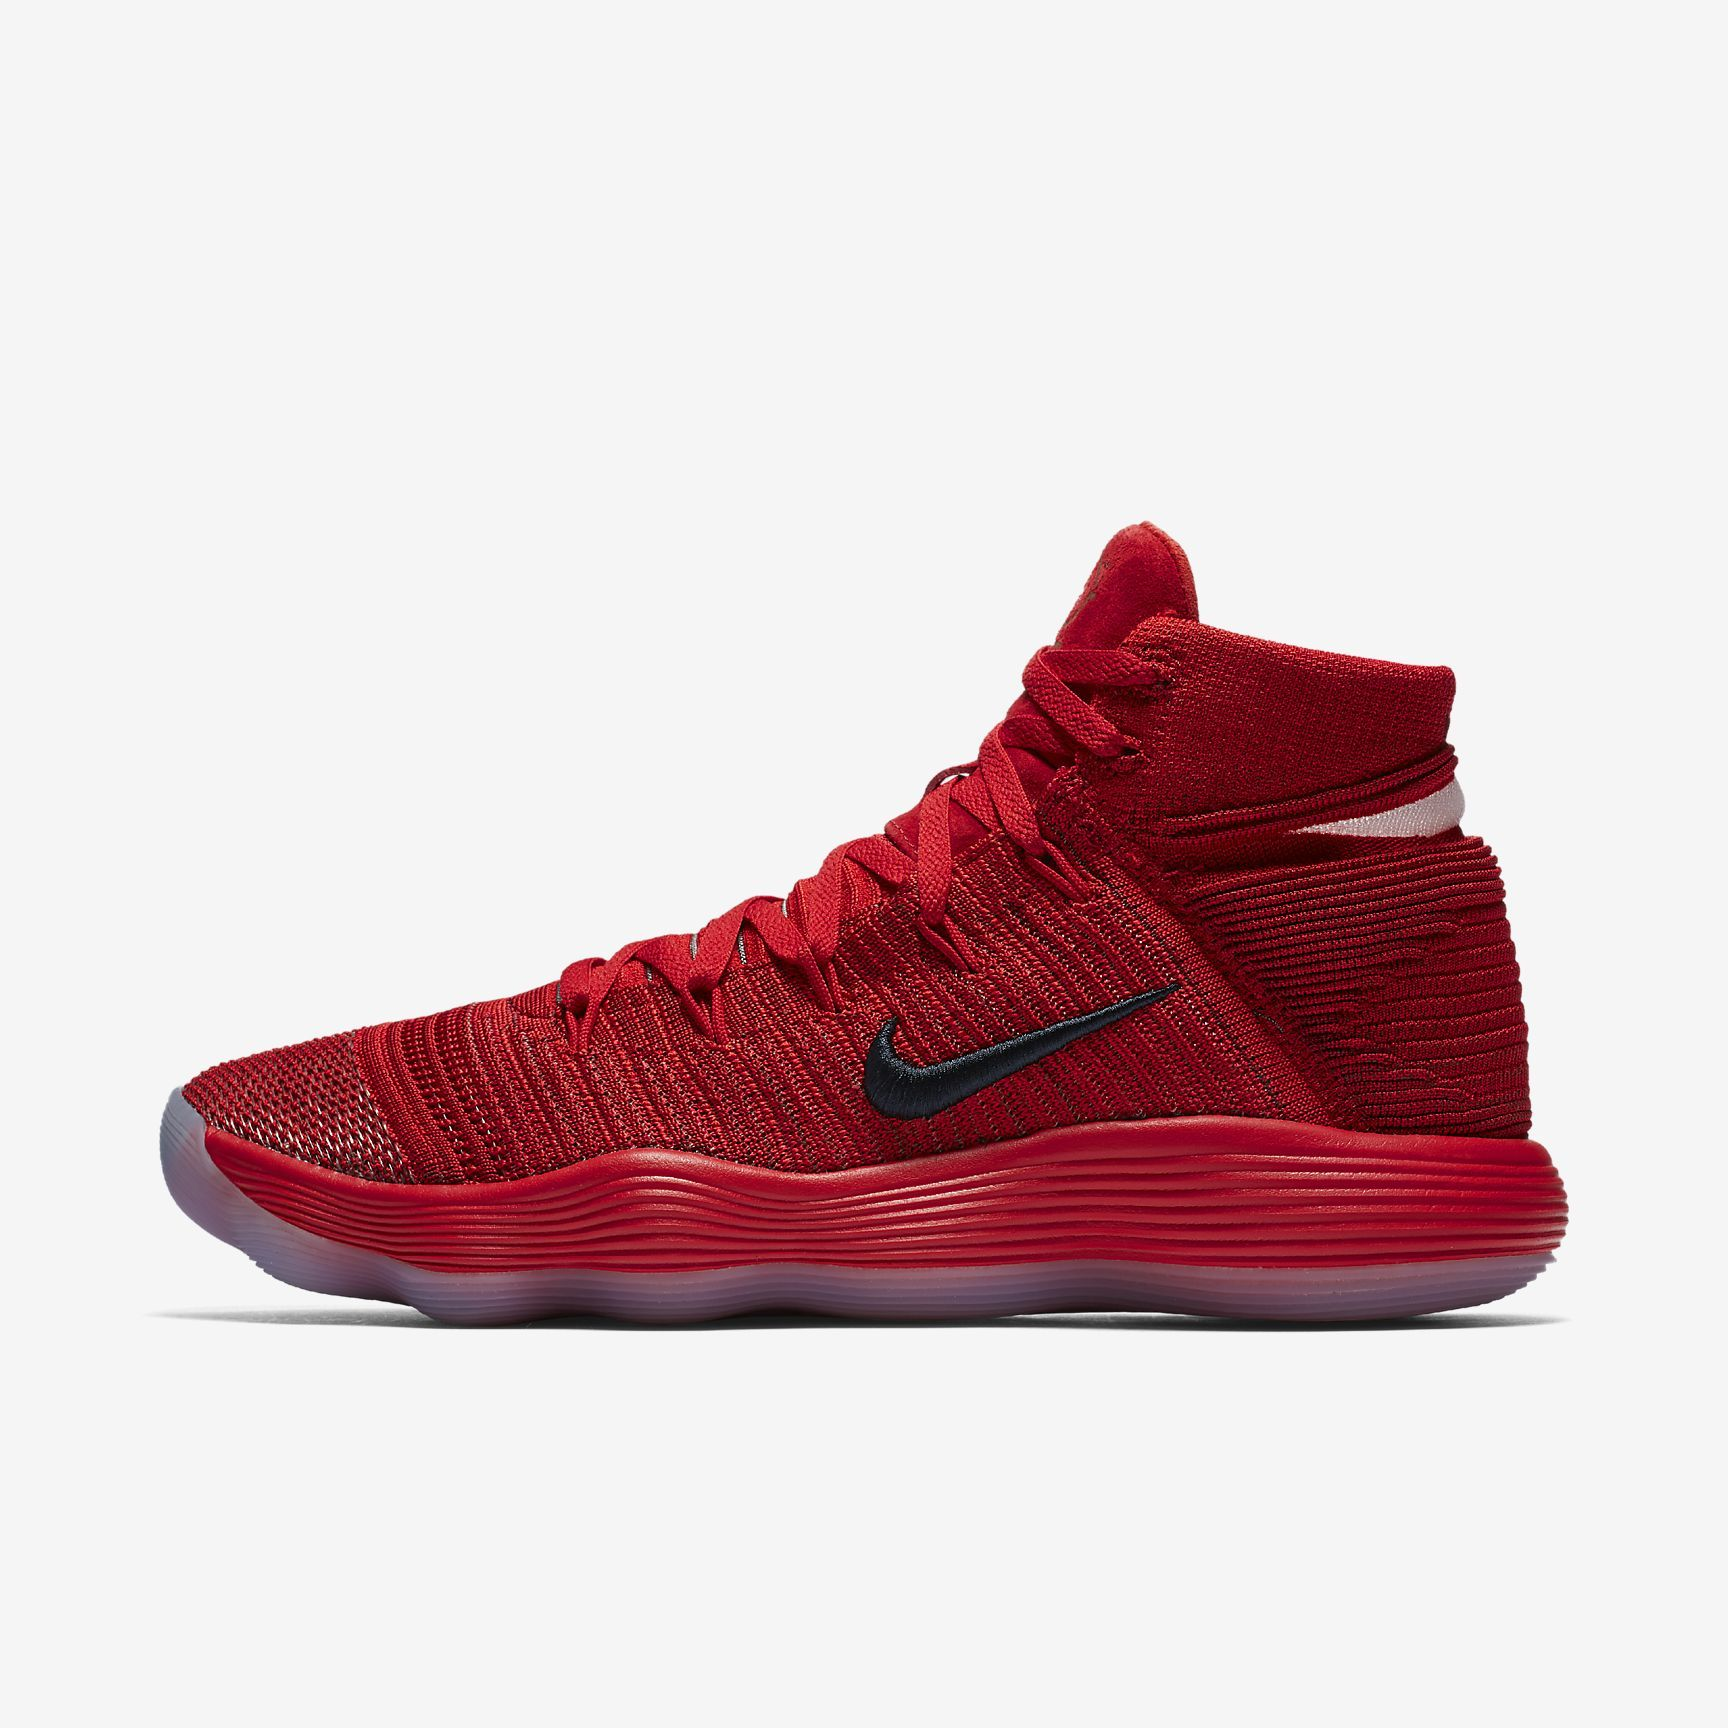 sale retailer 62a46 41fe5 Nike React Hyperdunk 2017 Flyknit Basketball Shoe